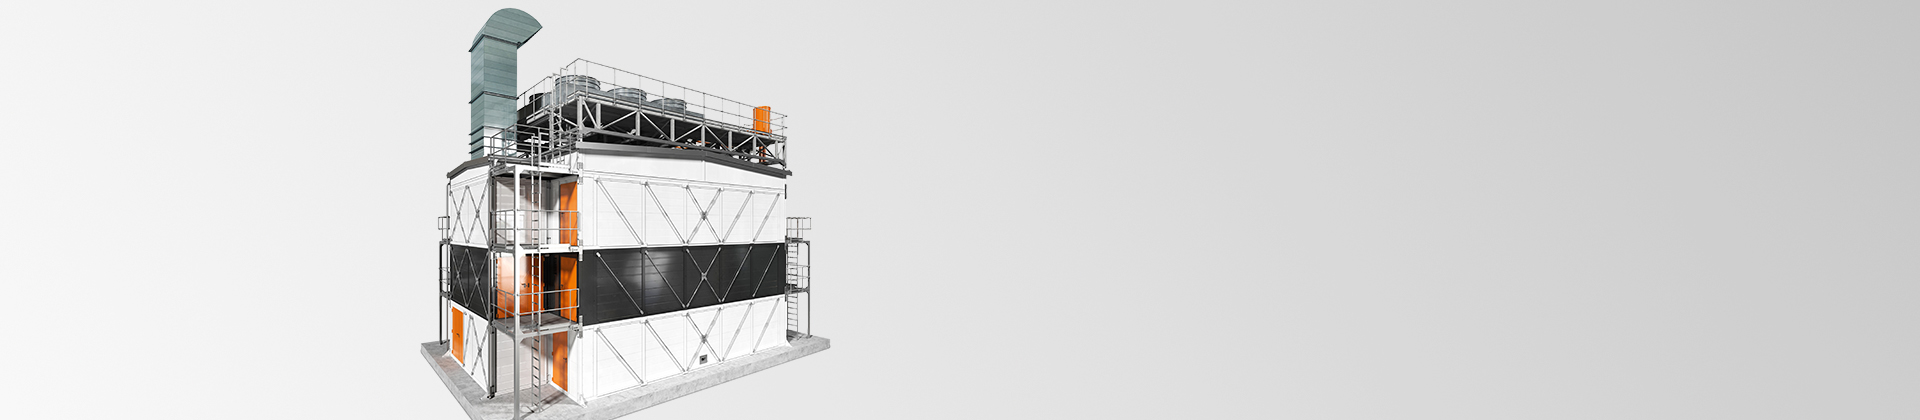 Wärtsilä Modular Block webinar